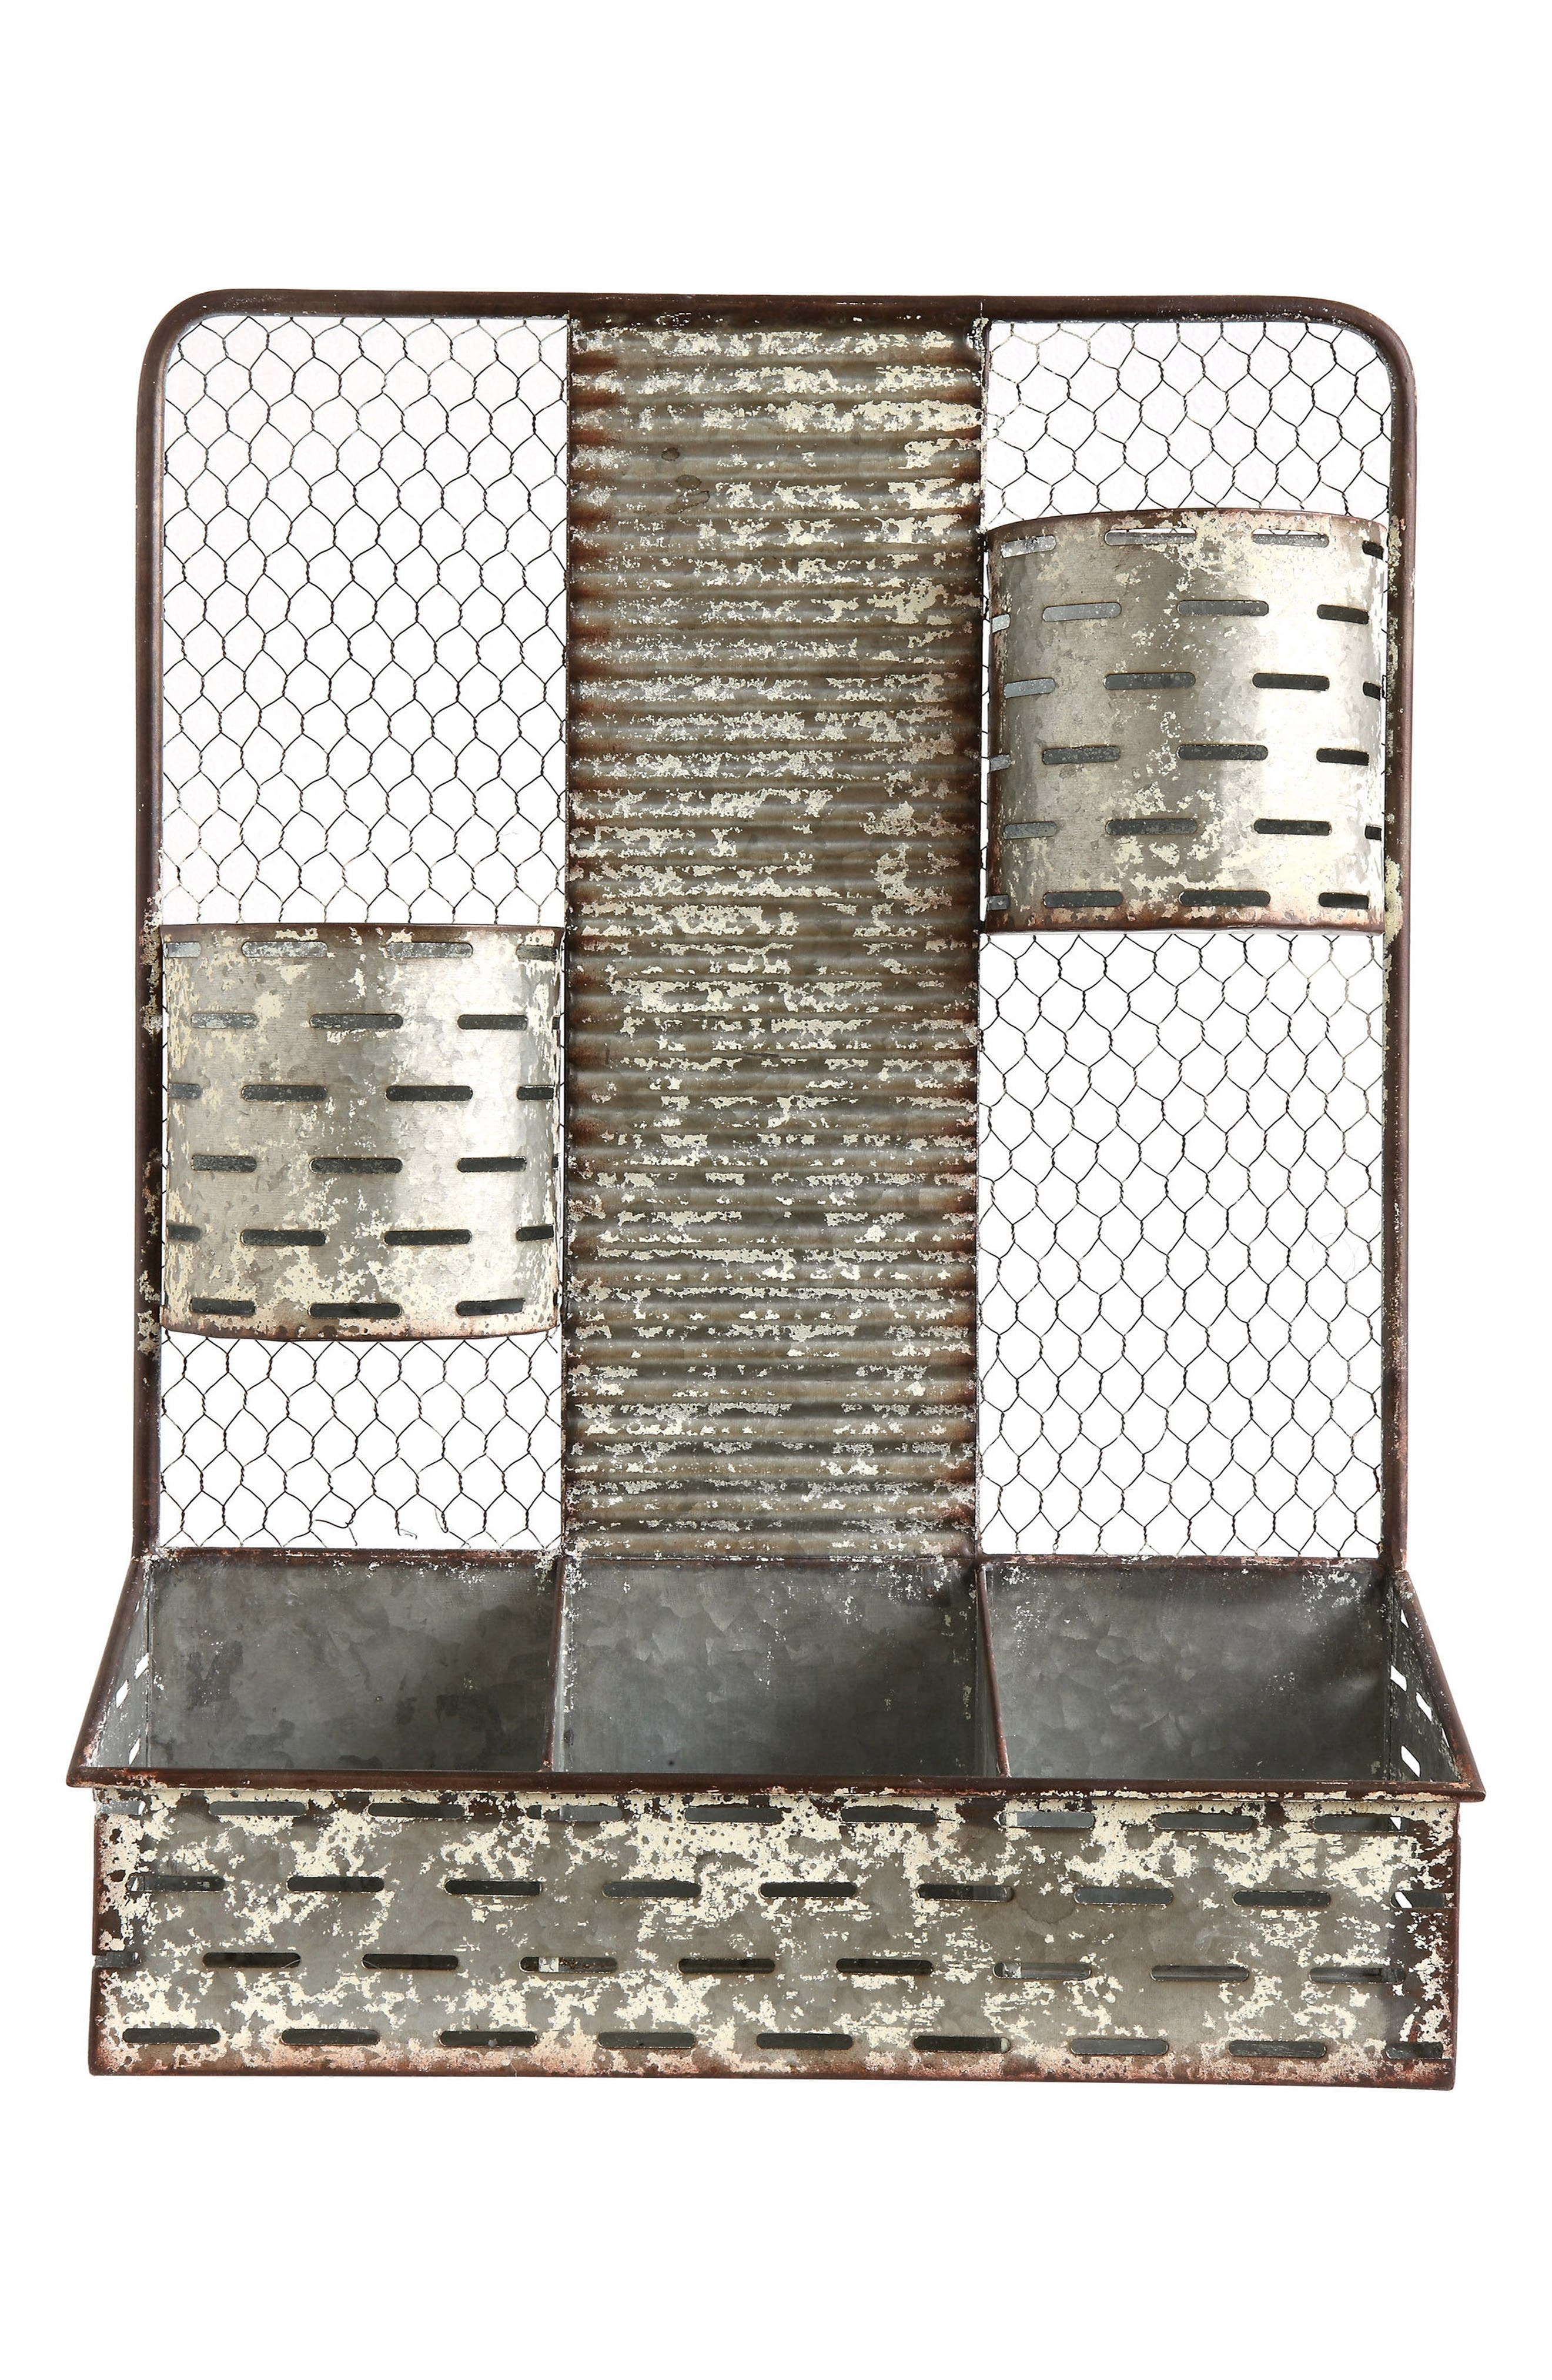 5-Compartment Metal Shelf Organizer,                         Main,                         color, 020